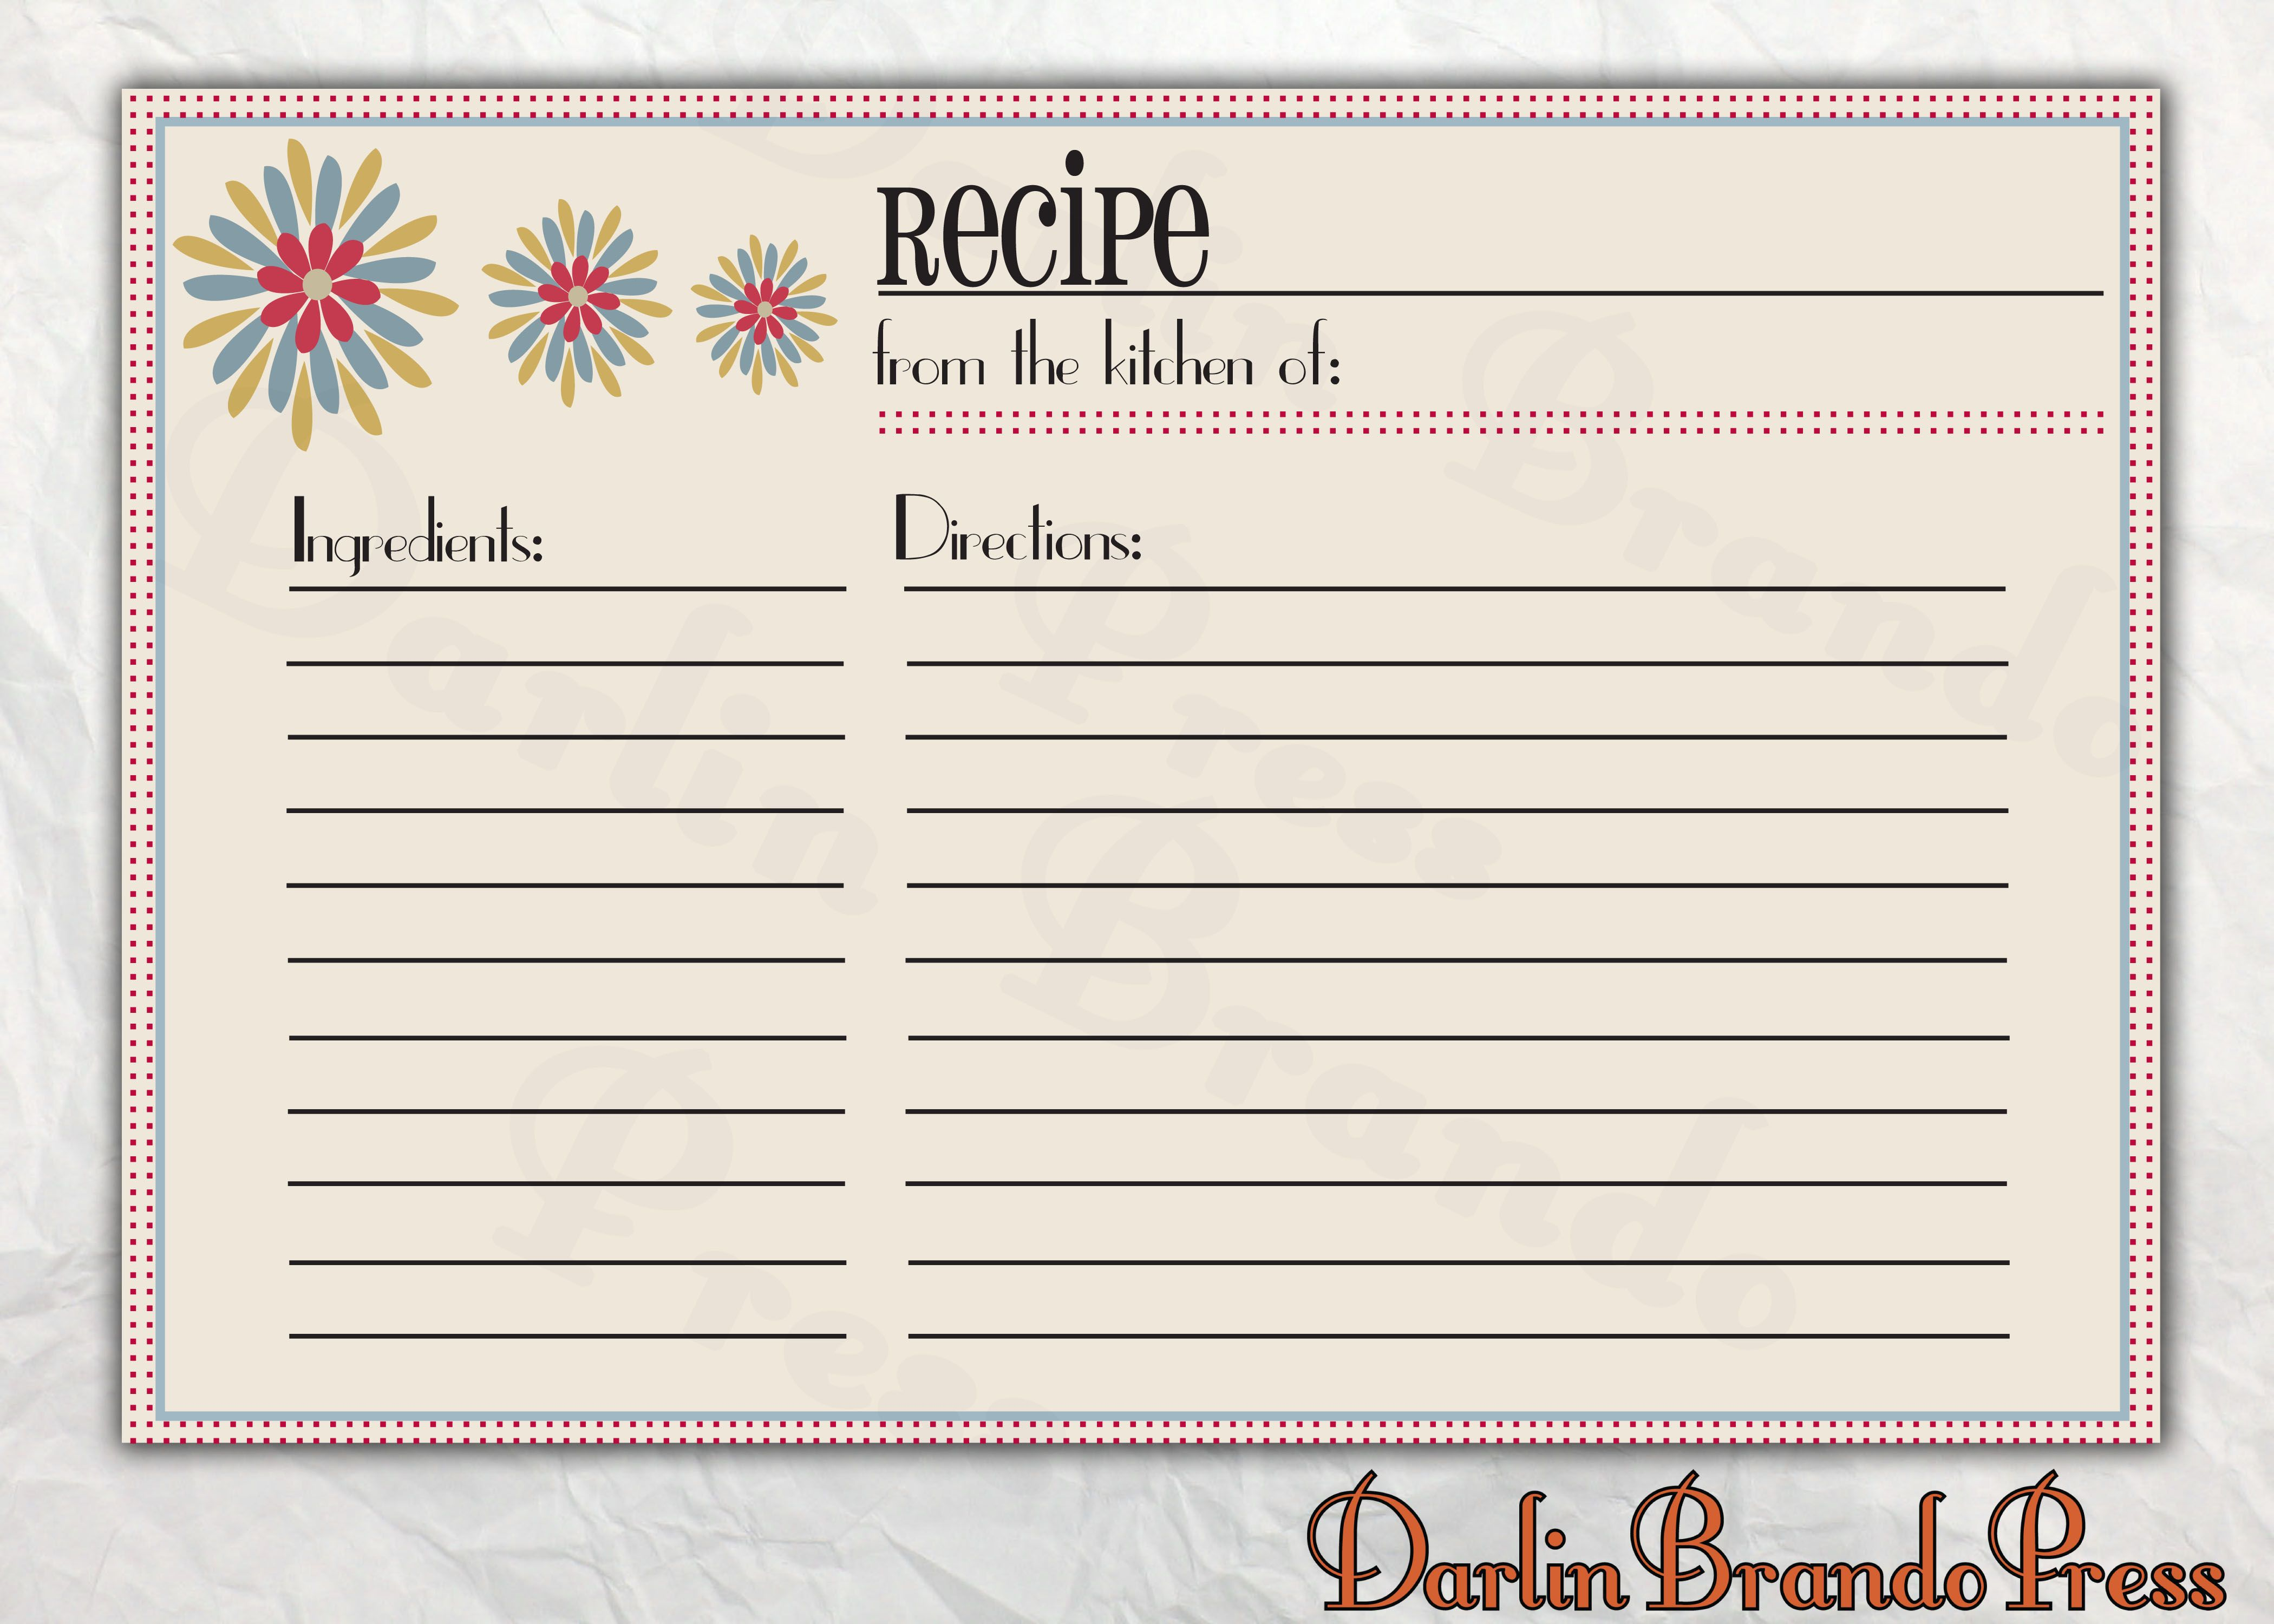 004 Wonderful Editable Recipe Card Template High Definition  Free For Microsoft Word 4x6 PageFull